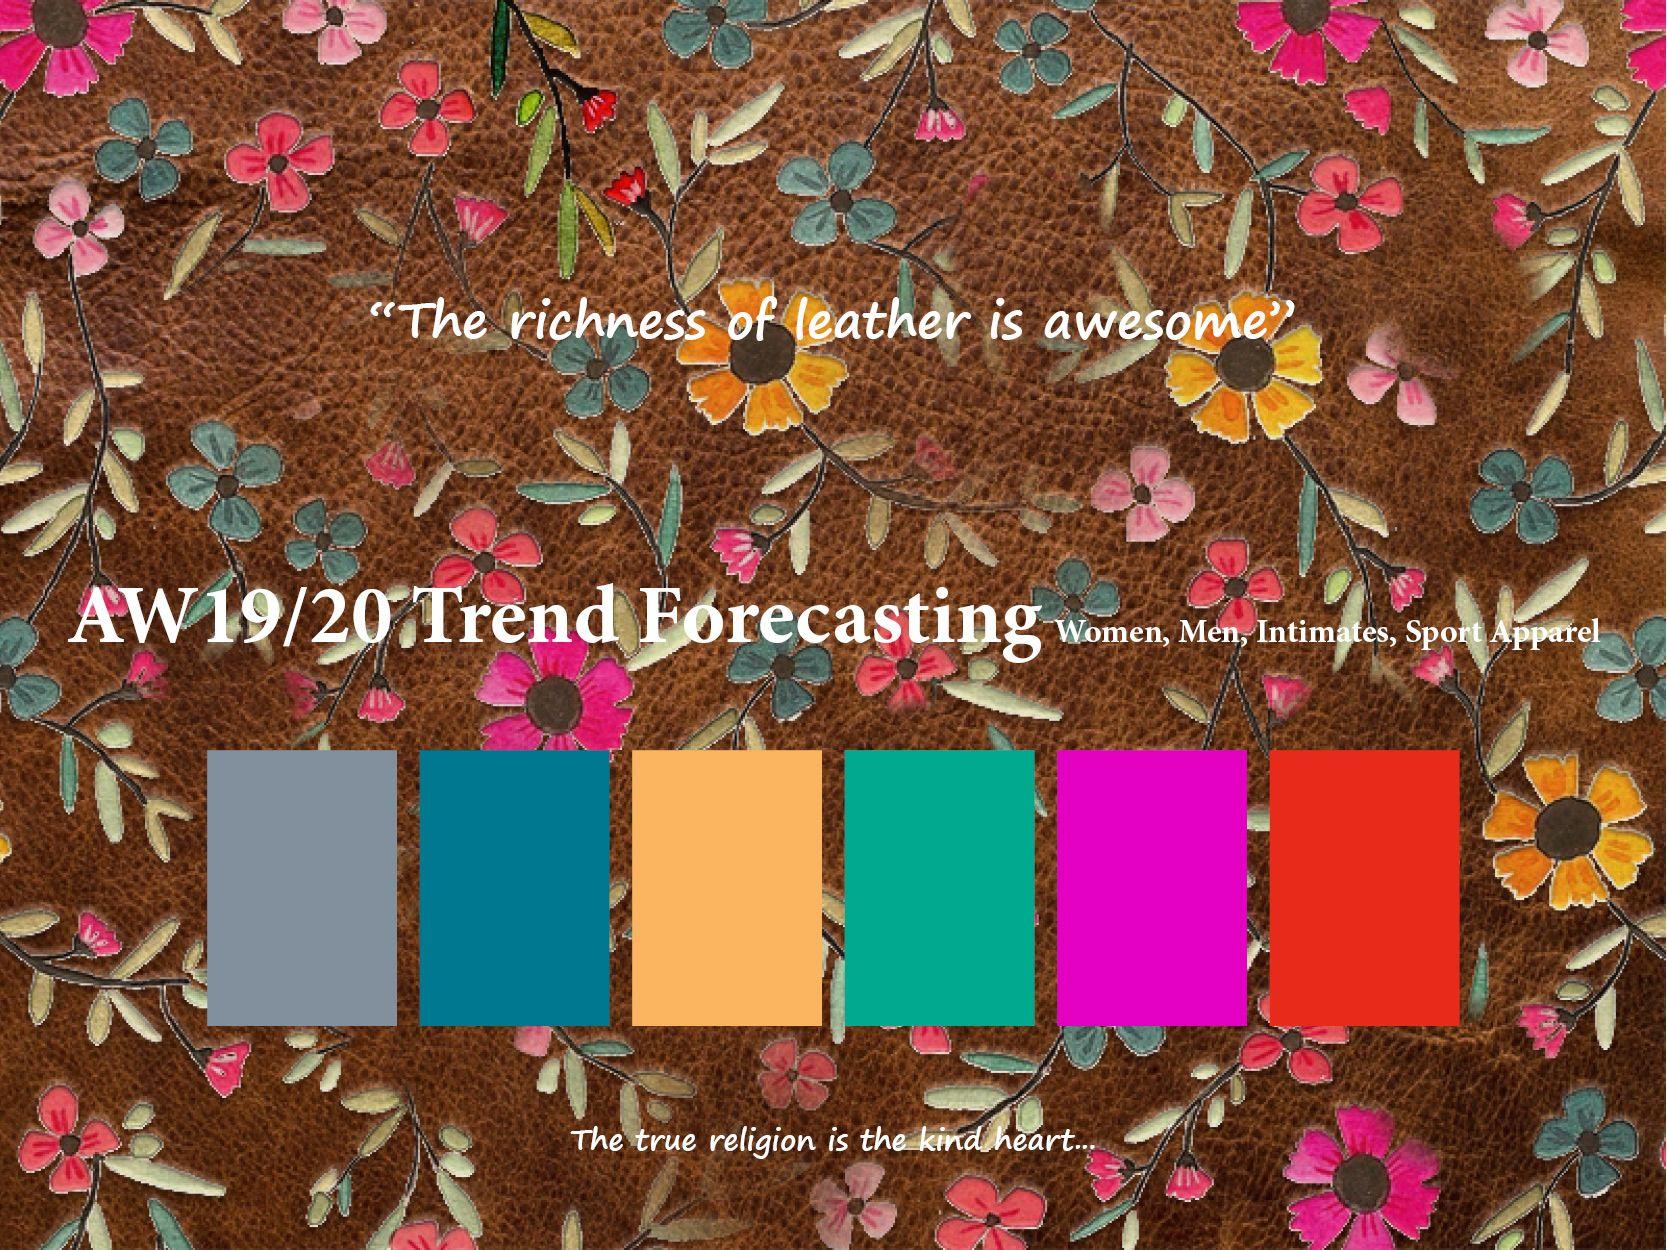 Autumn iWinteri 2020 i2020i Trend Forecasting for Women Men